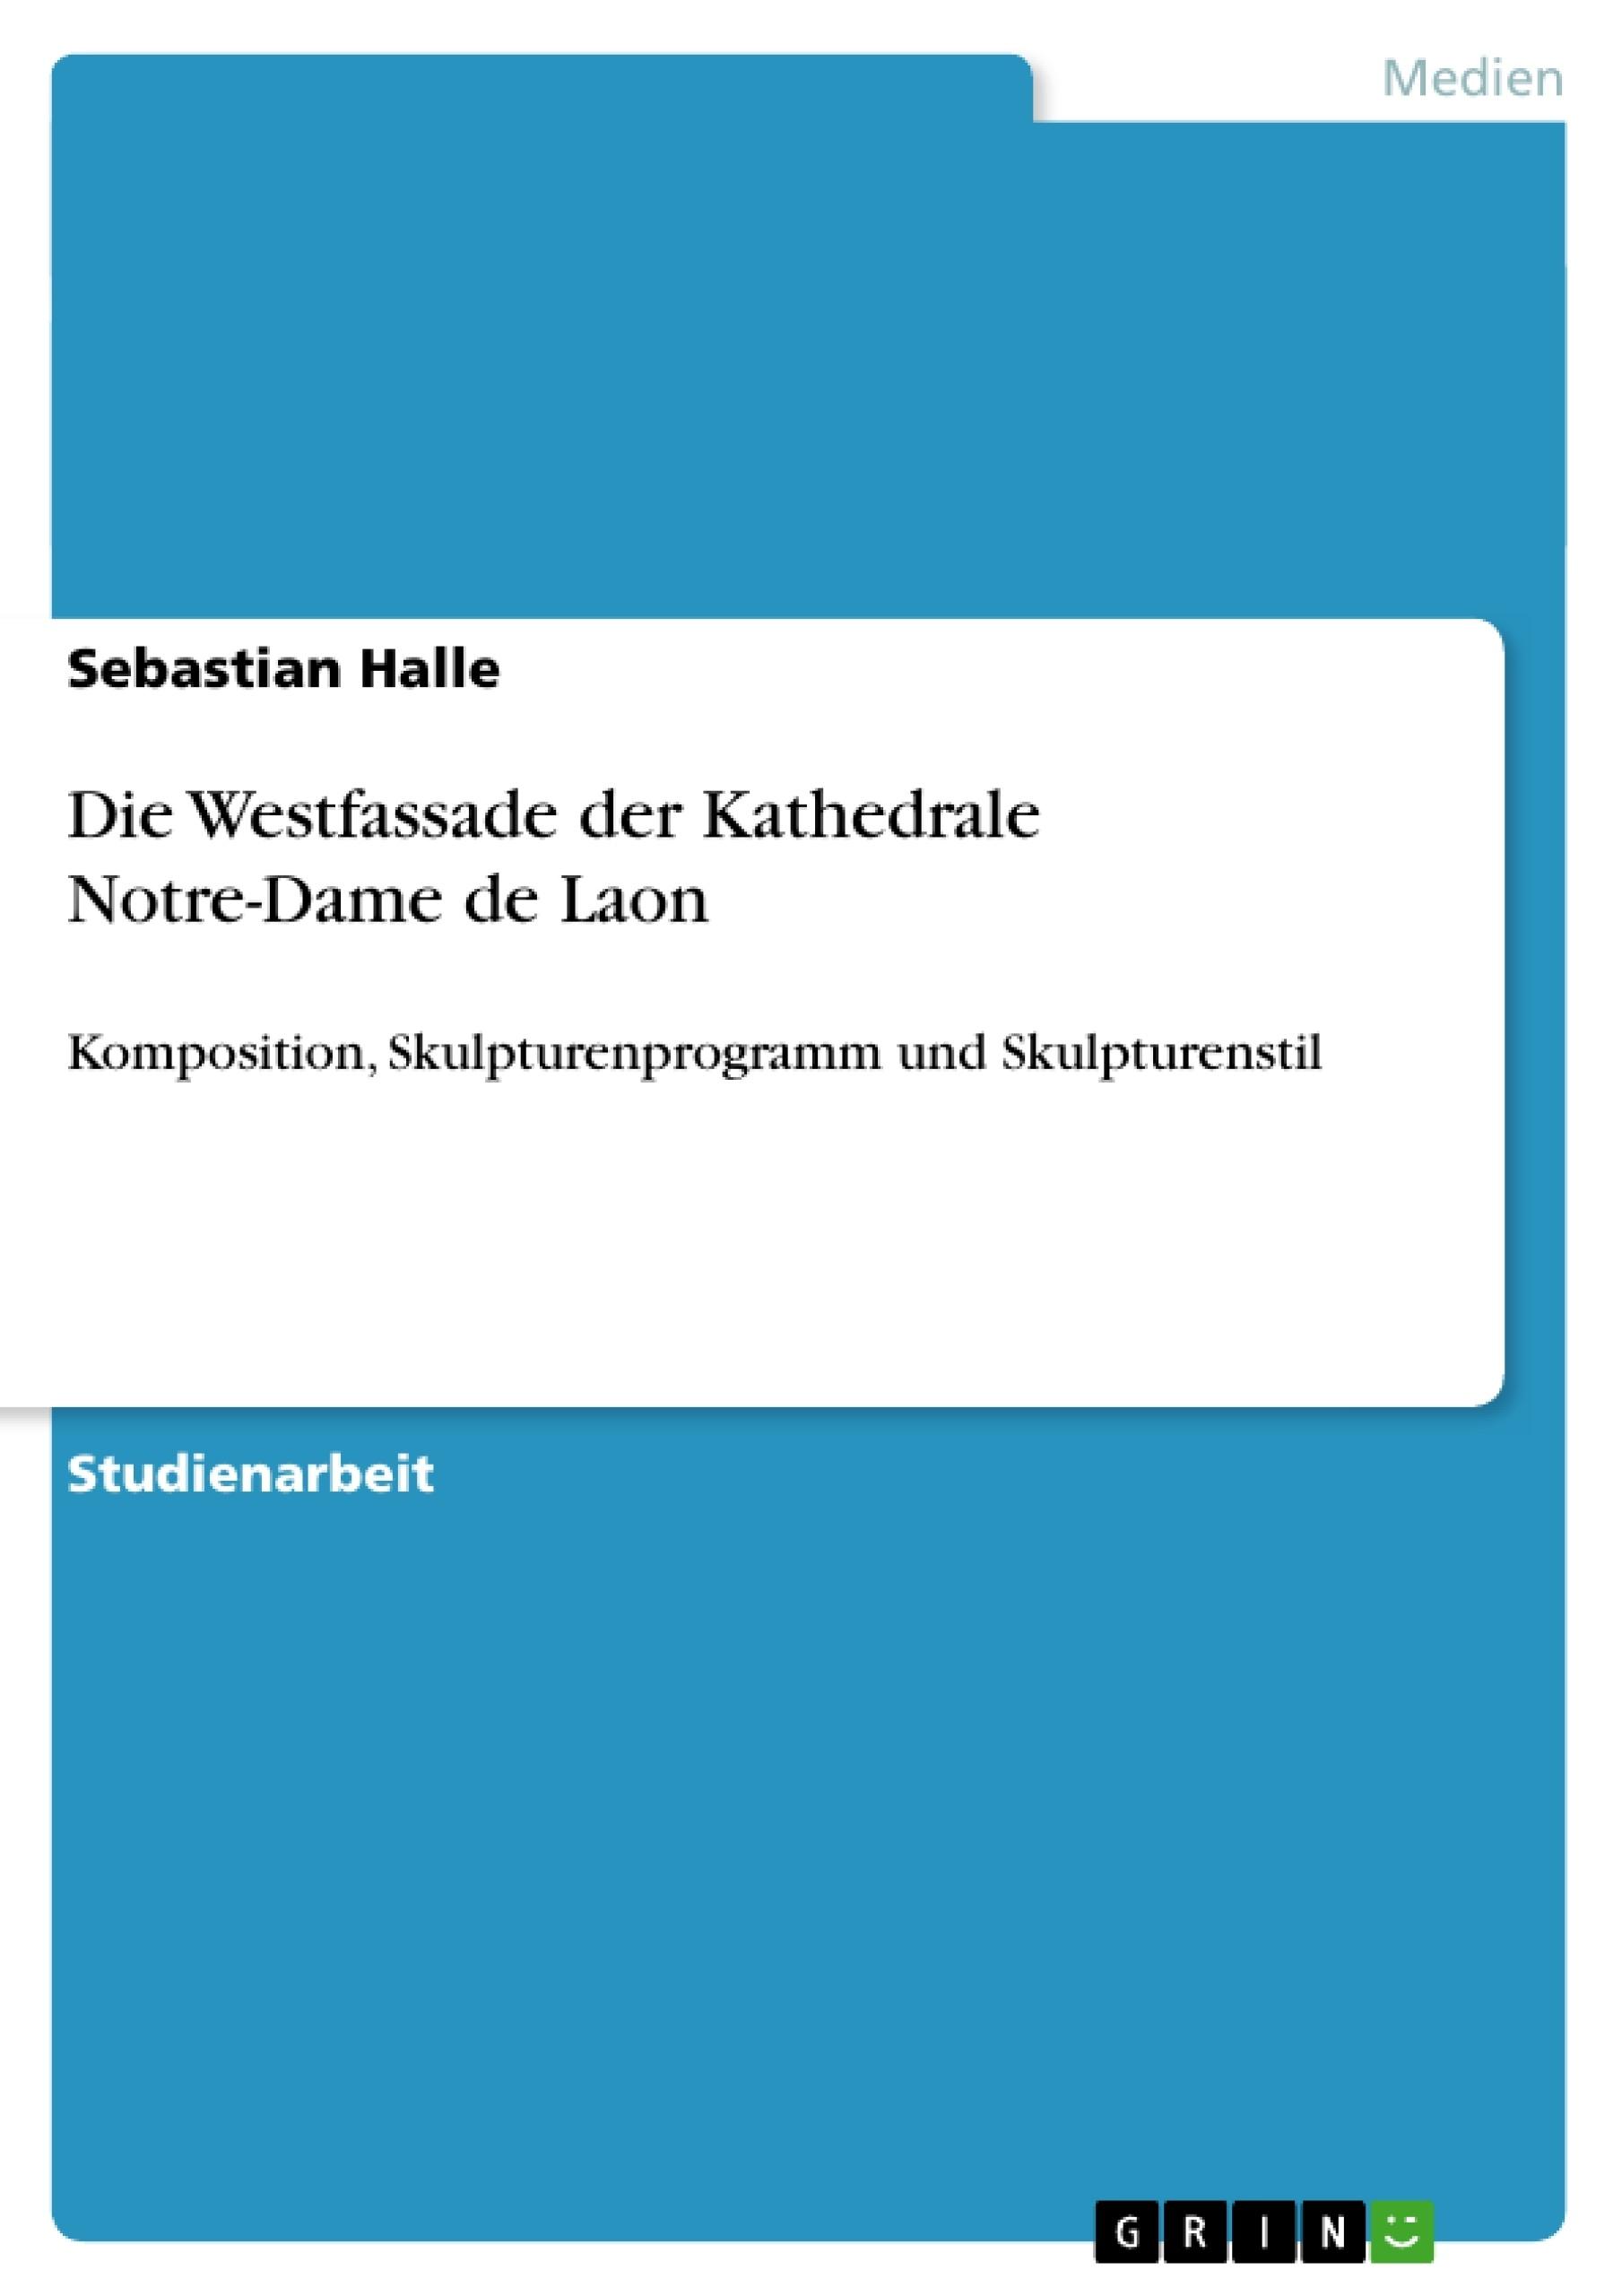 Titel: Die Westfassade der Kathedrale Notre-Dame de Laon